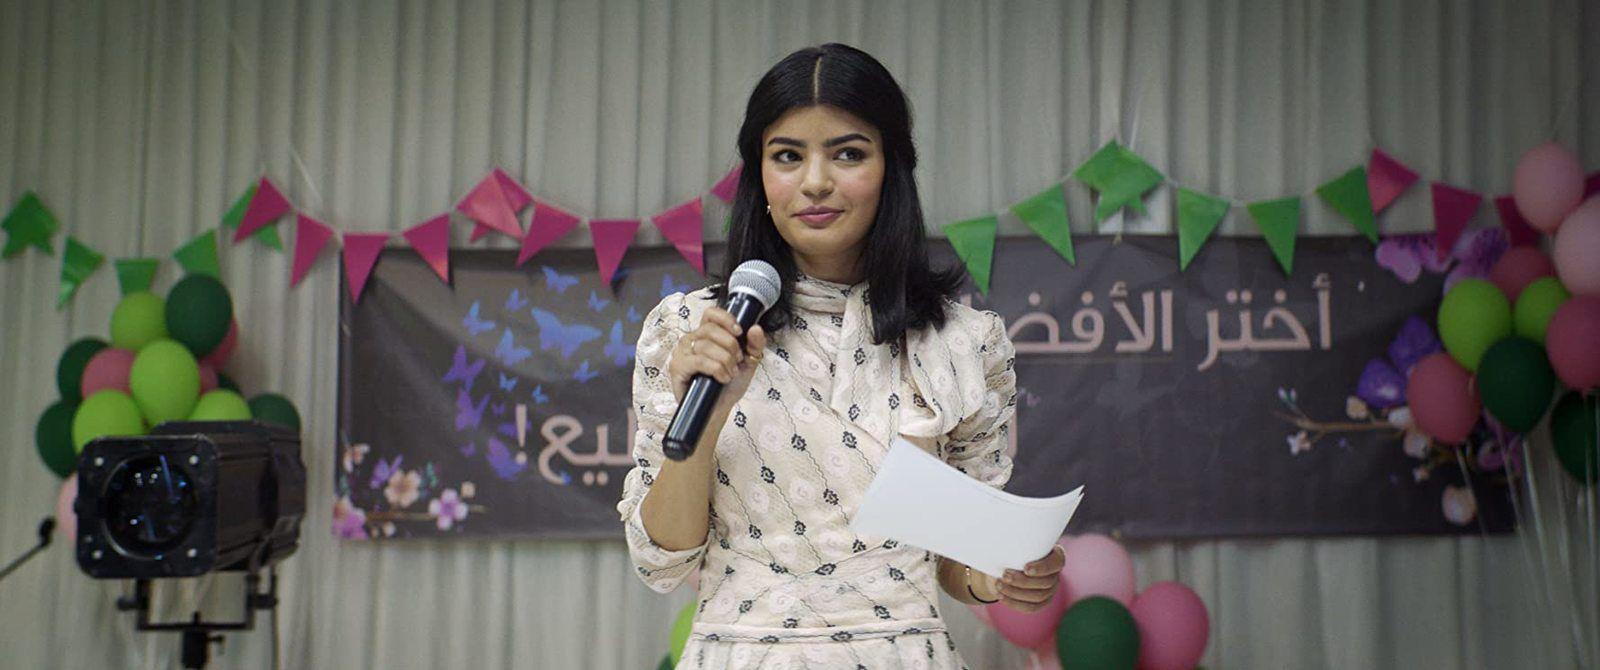 La candidate idéale (BANDE-ANNONCE) avec Nora Al Awadh, Dae Al Hilali, Mila Al Zahrani